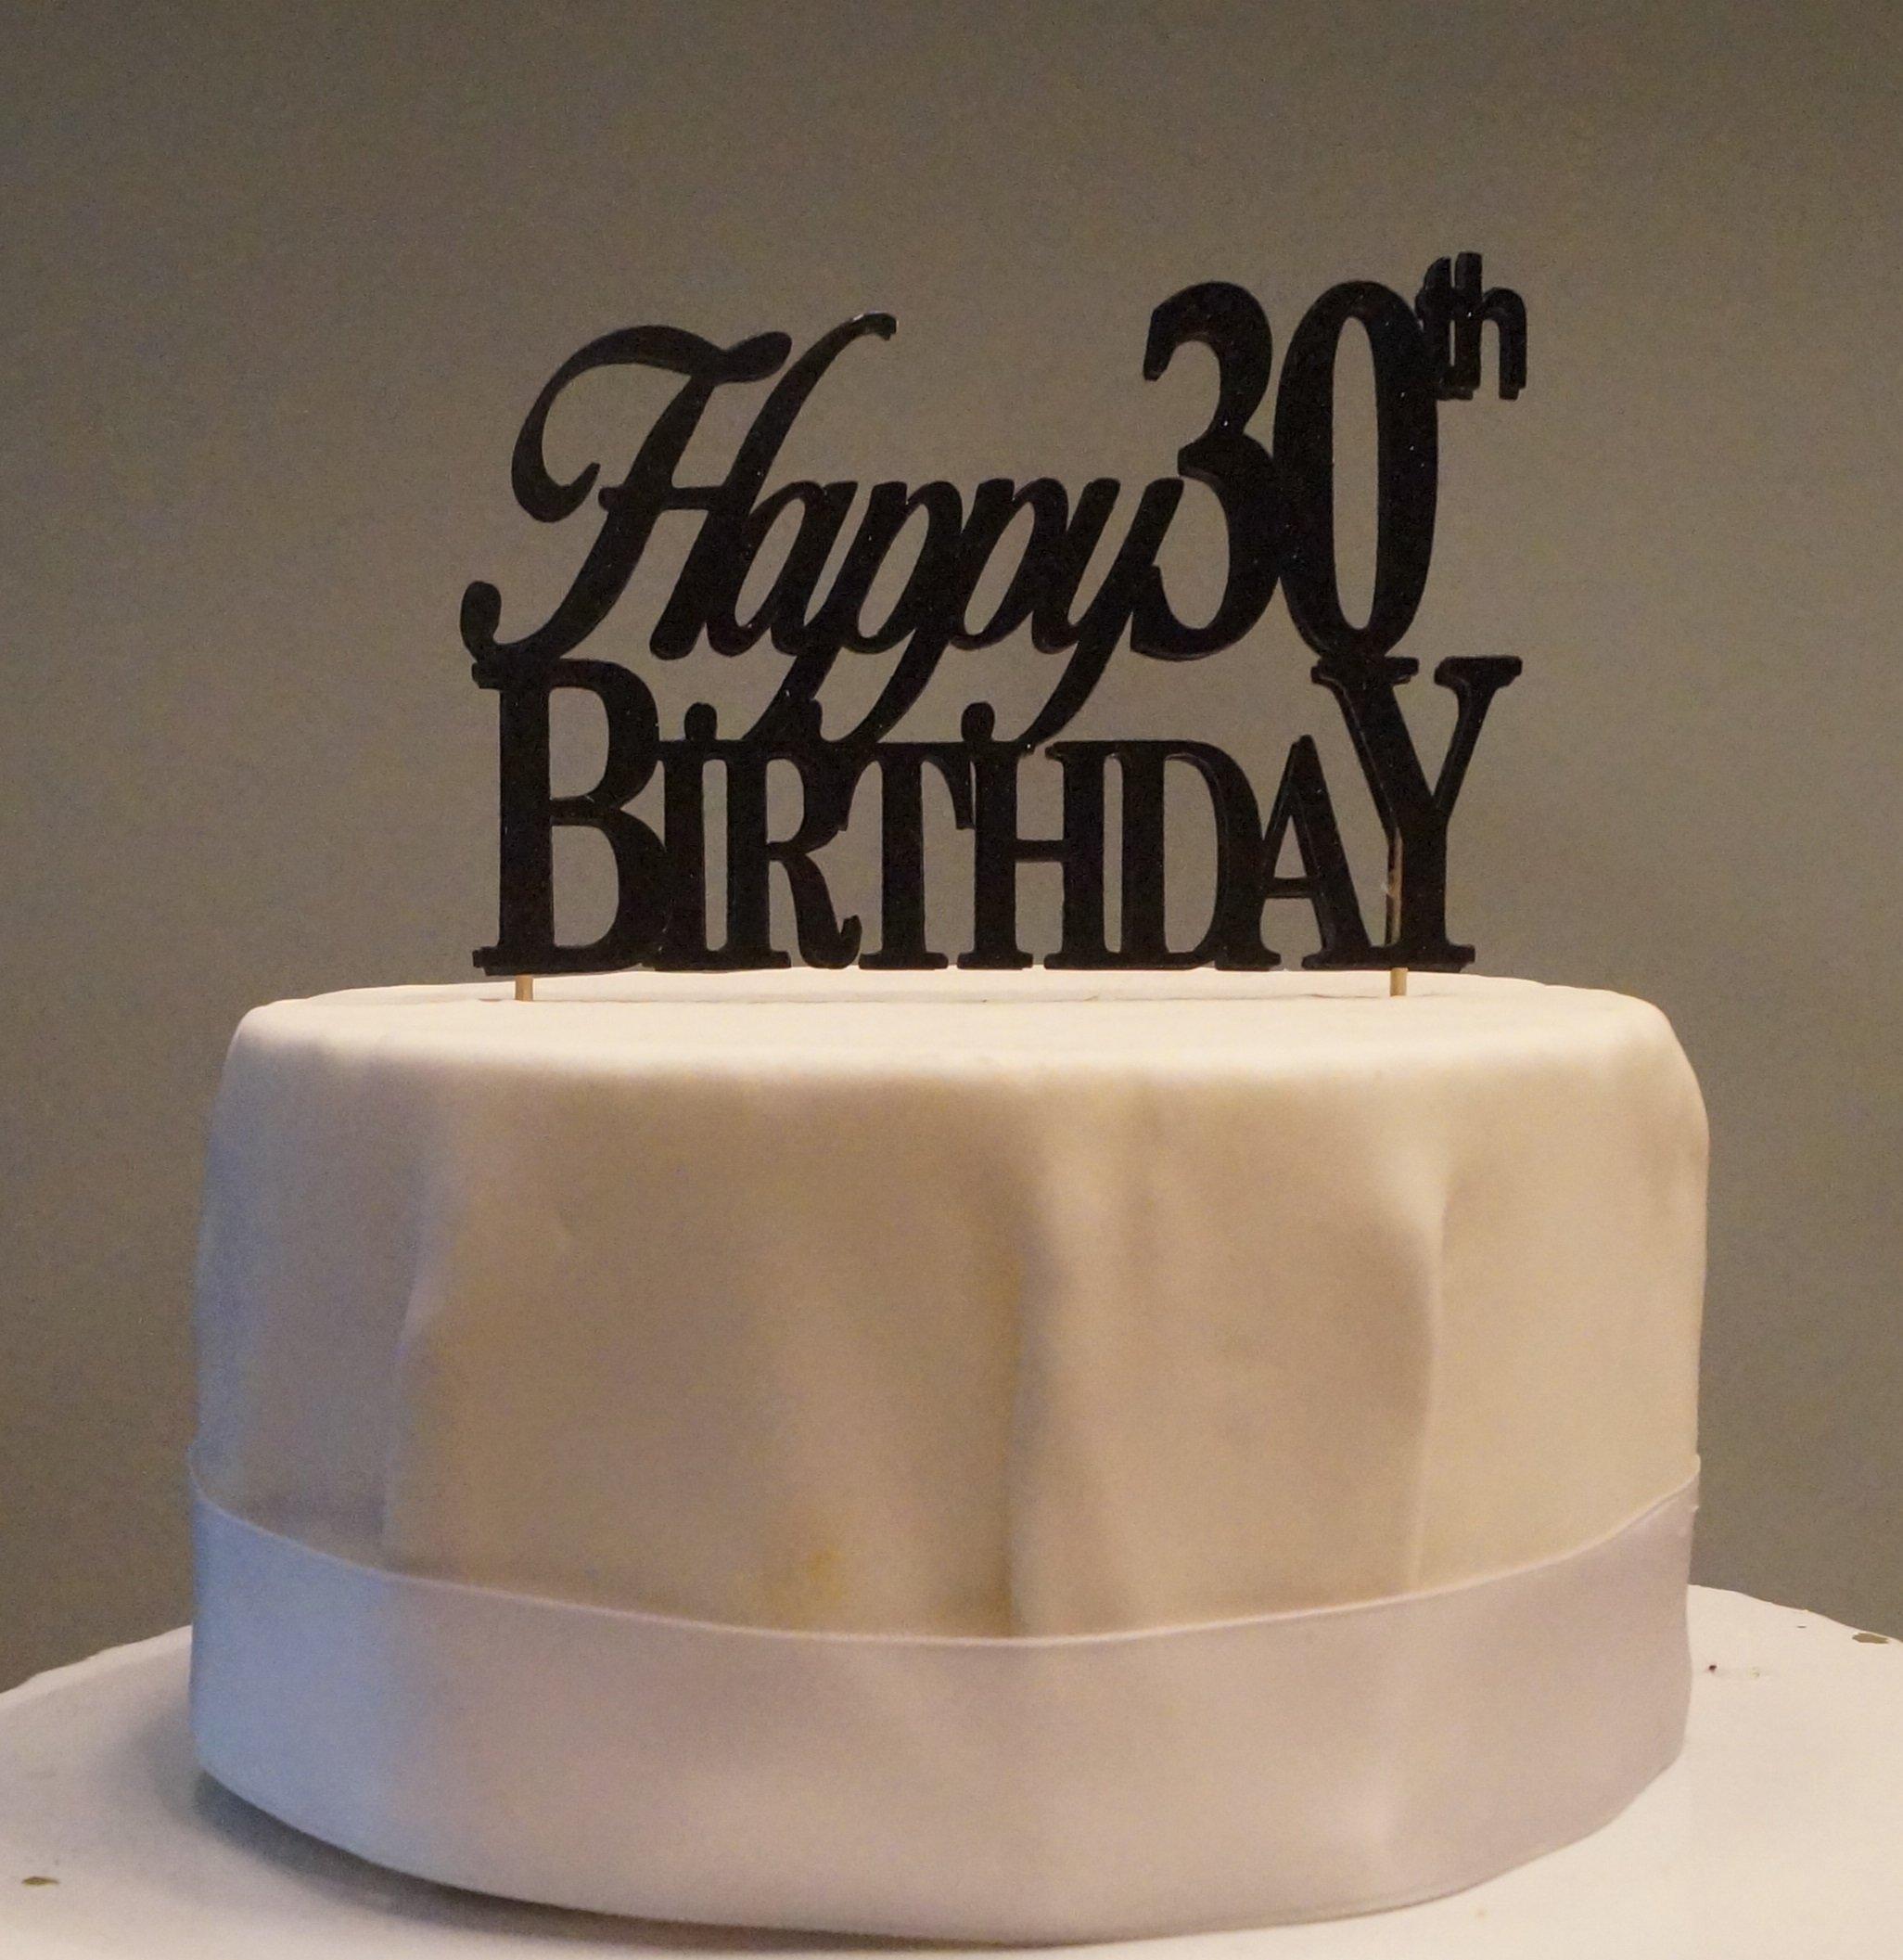 Strange Black Happy 30Th Birthday Cake Topper Buy Online In Egypt All Funny Birthday Cards Online Alyptdamsfinfo